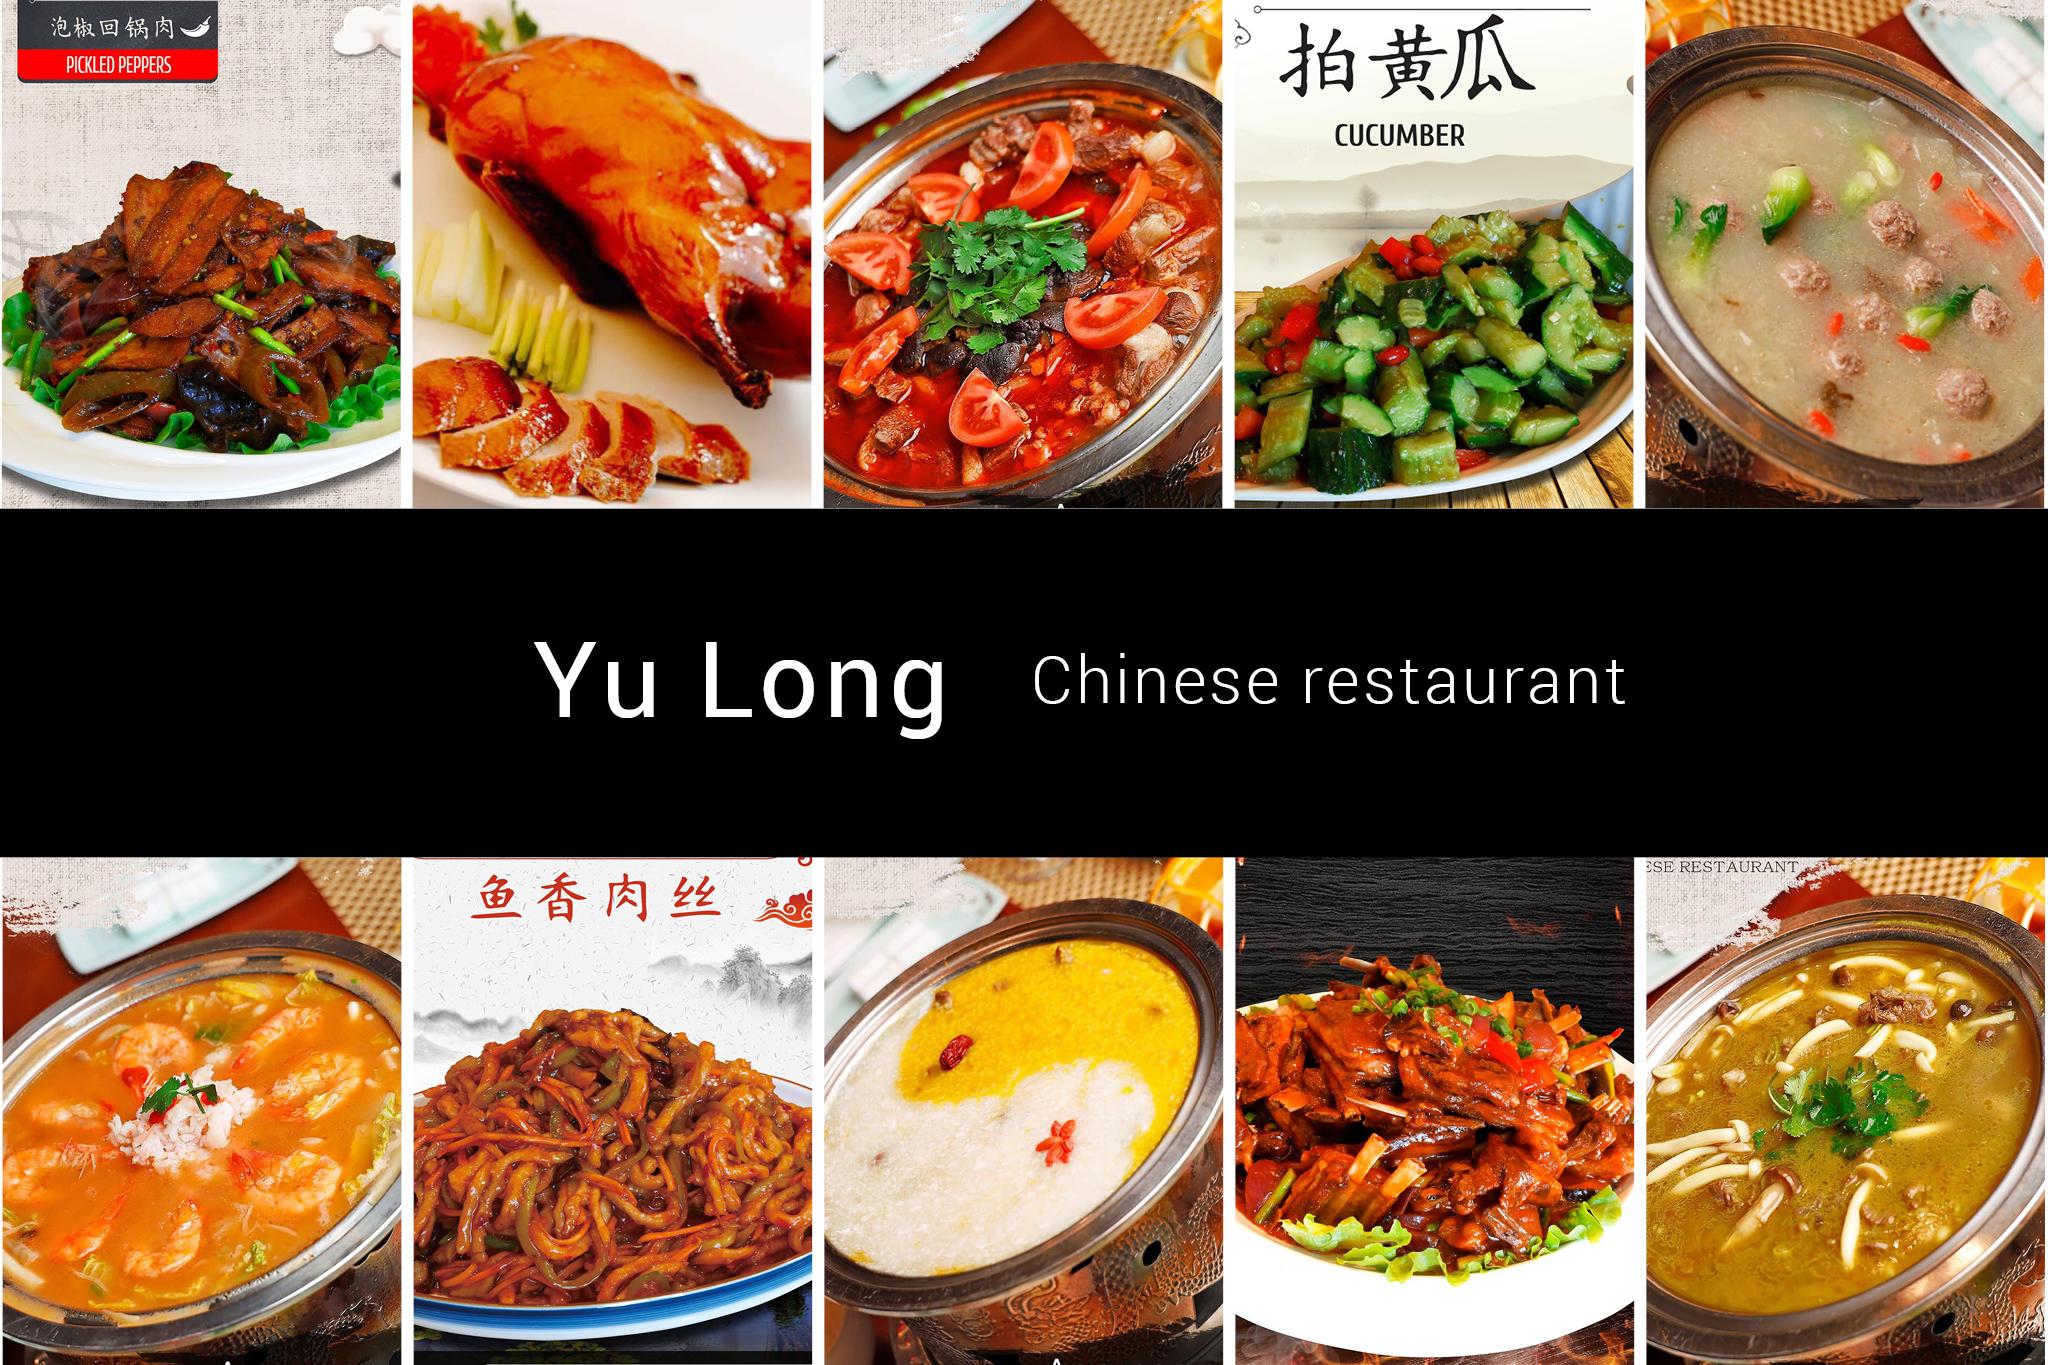 yulong